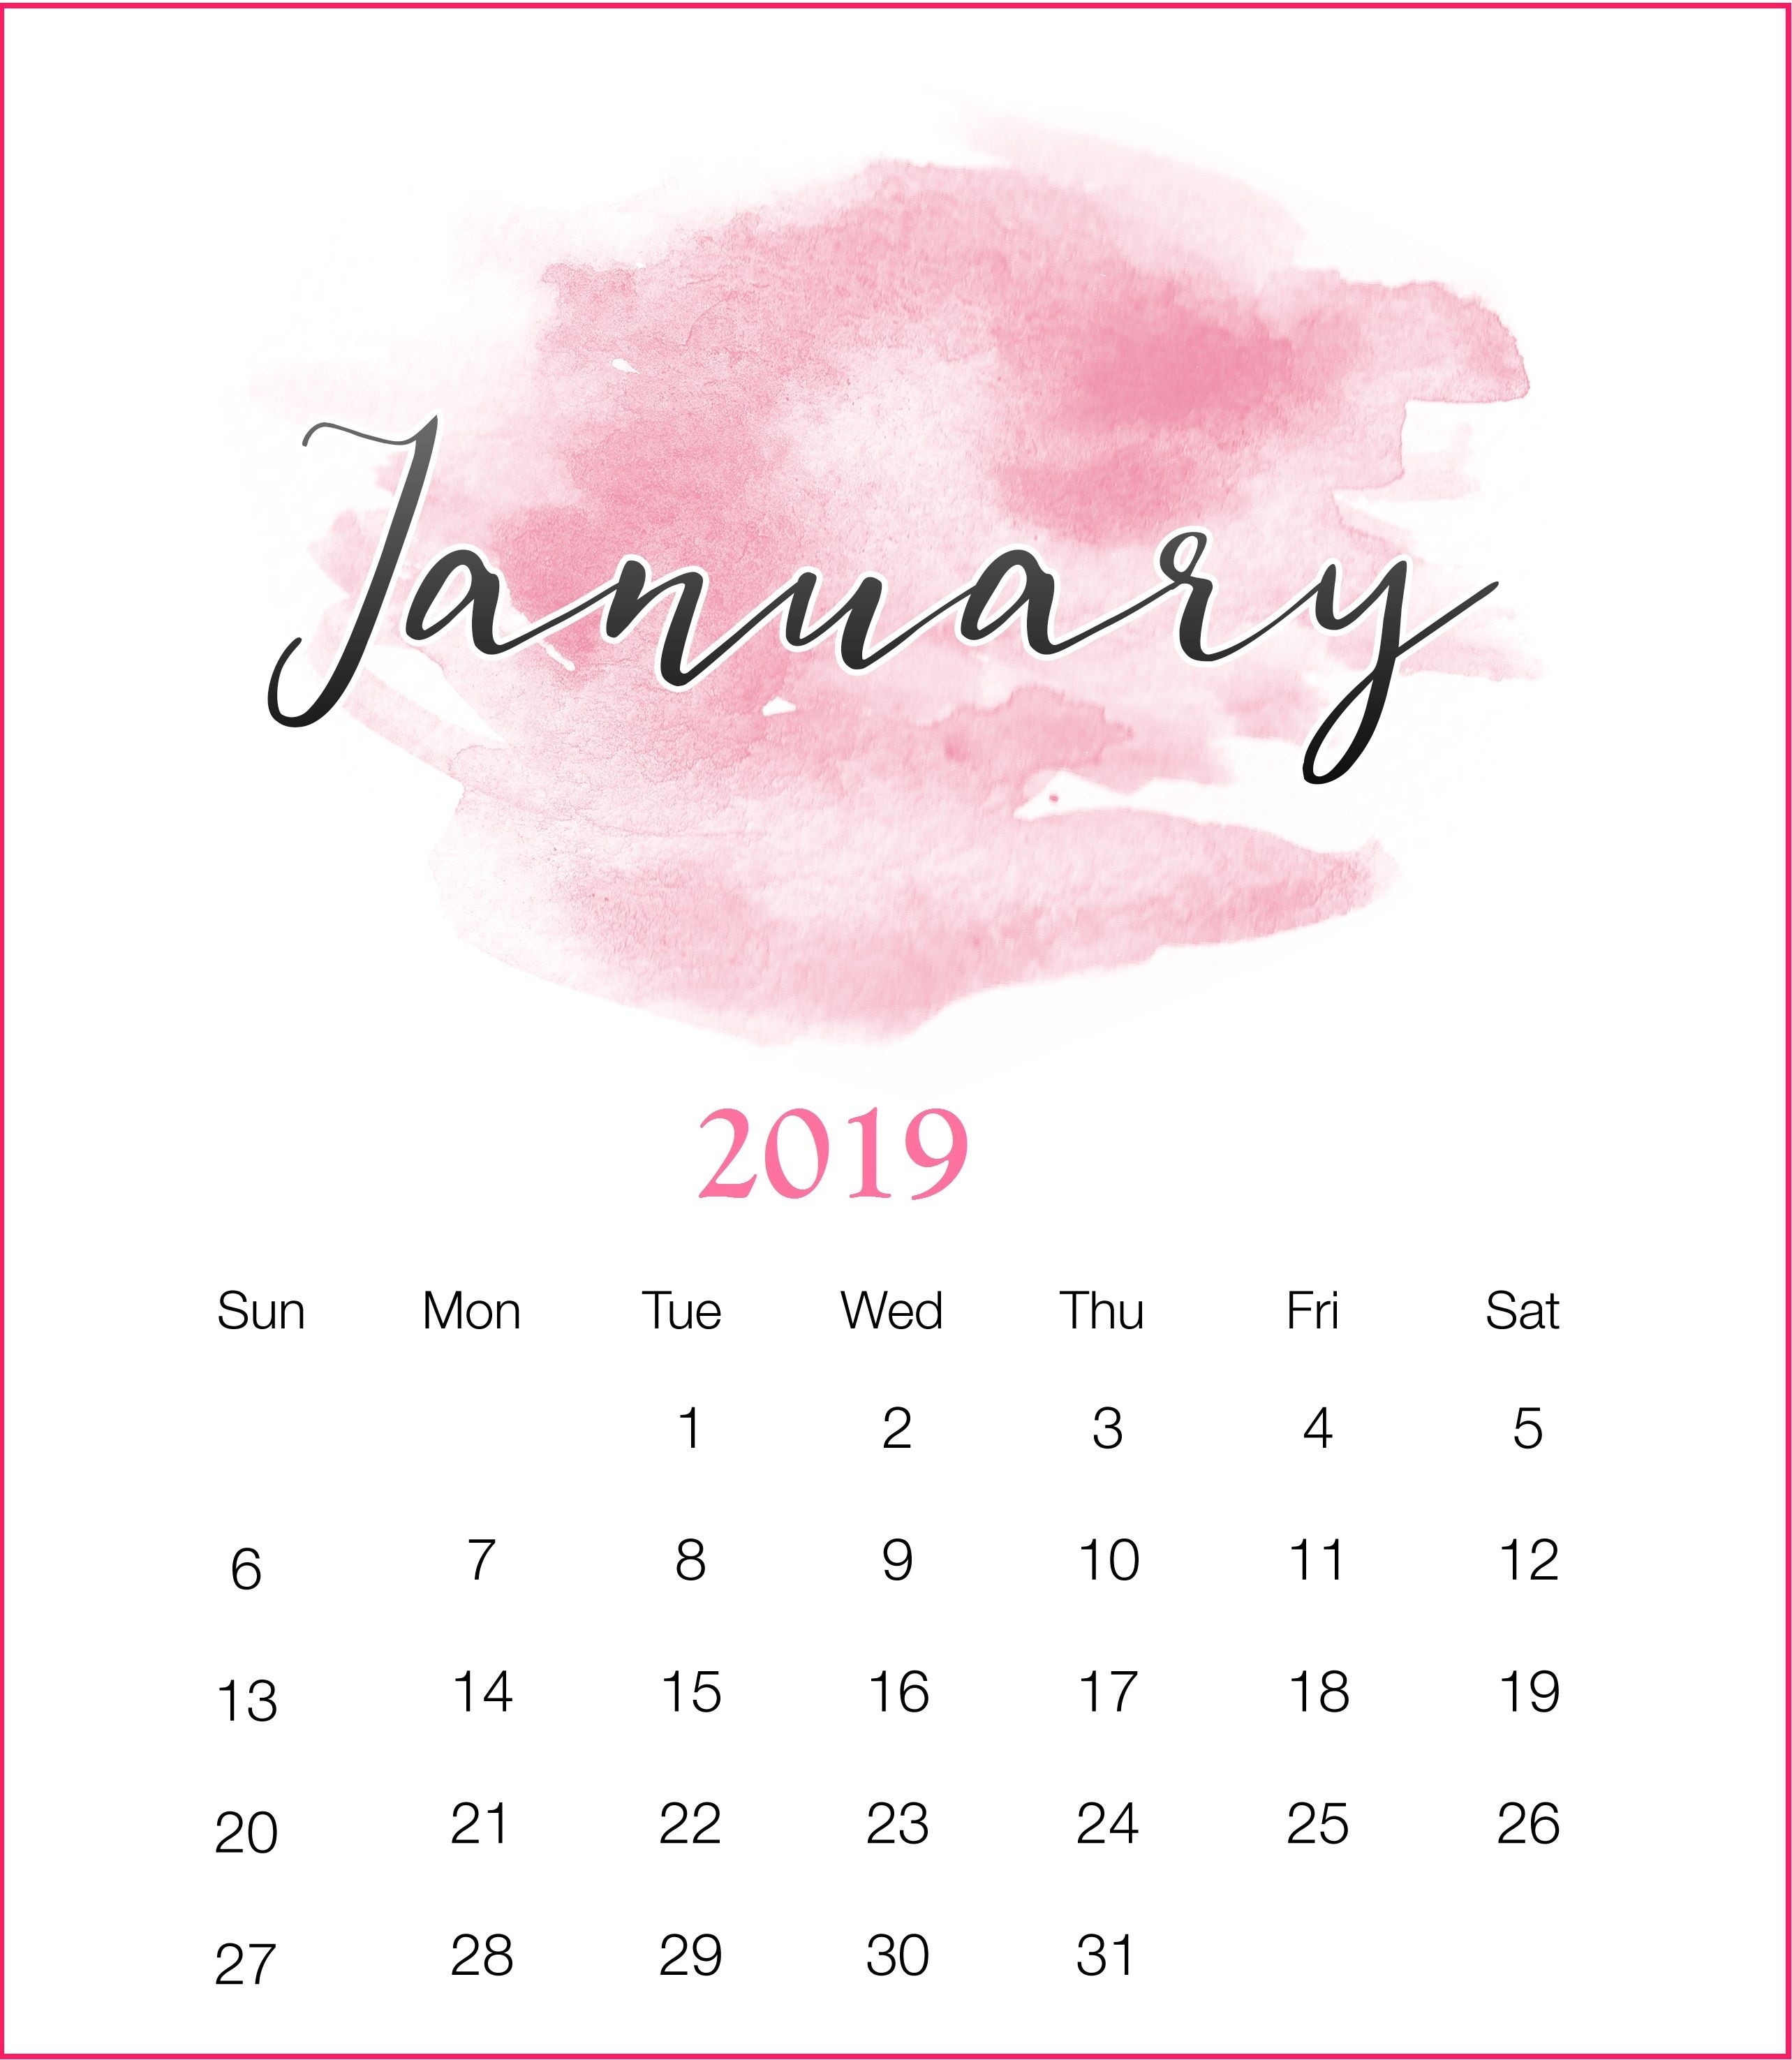 watercolor 2019 january printable calendar january2019 watercolor::January 2019 Monthly Calendar